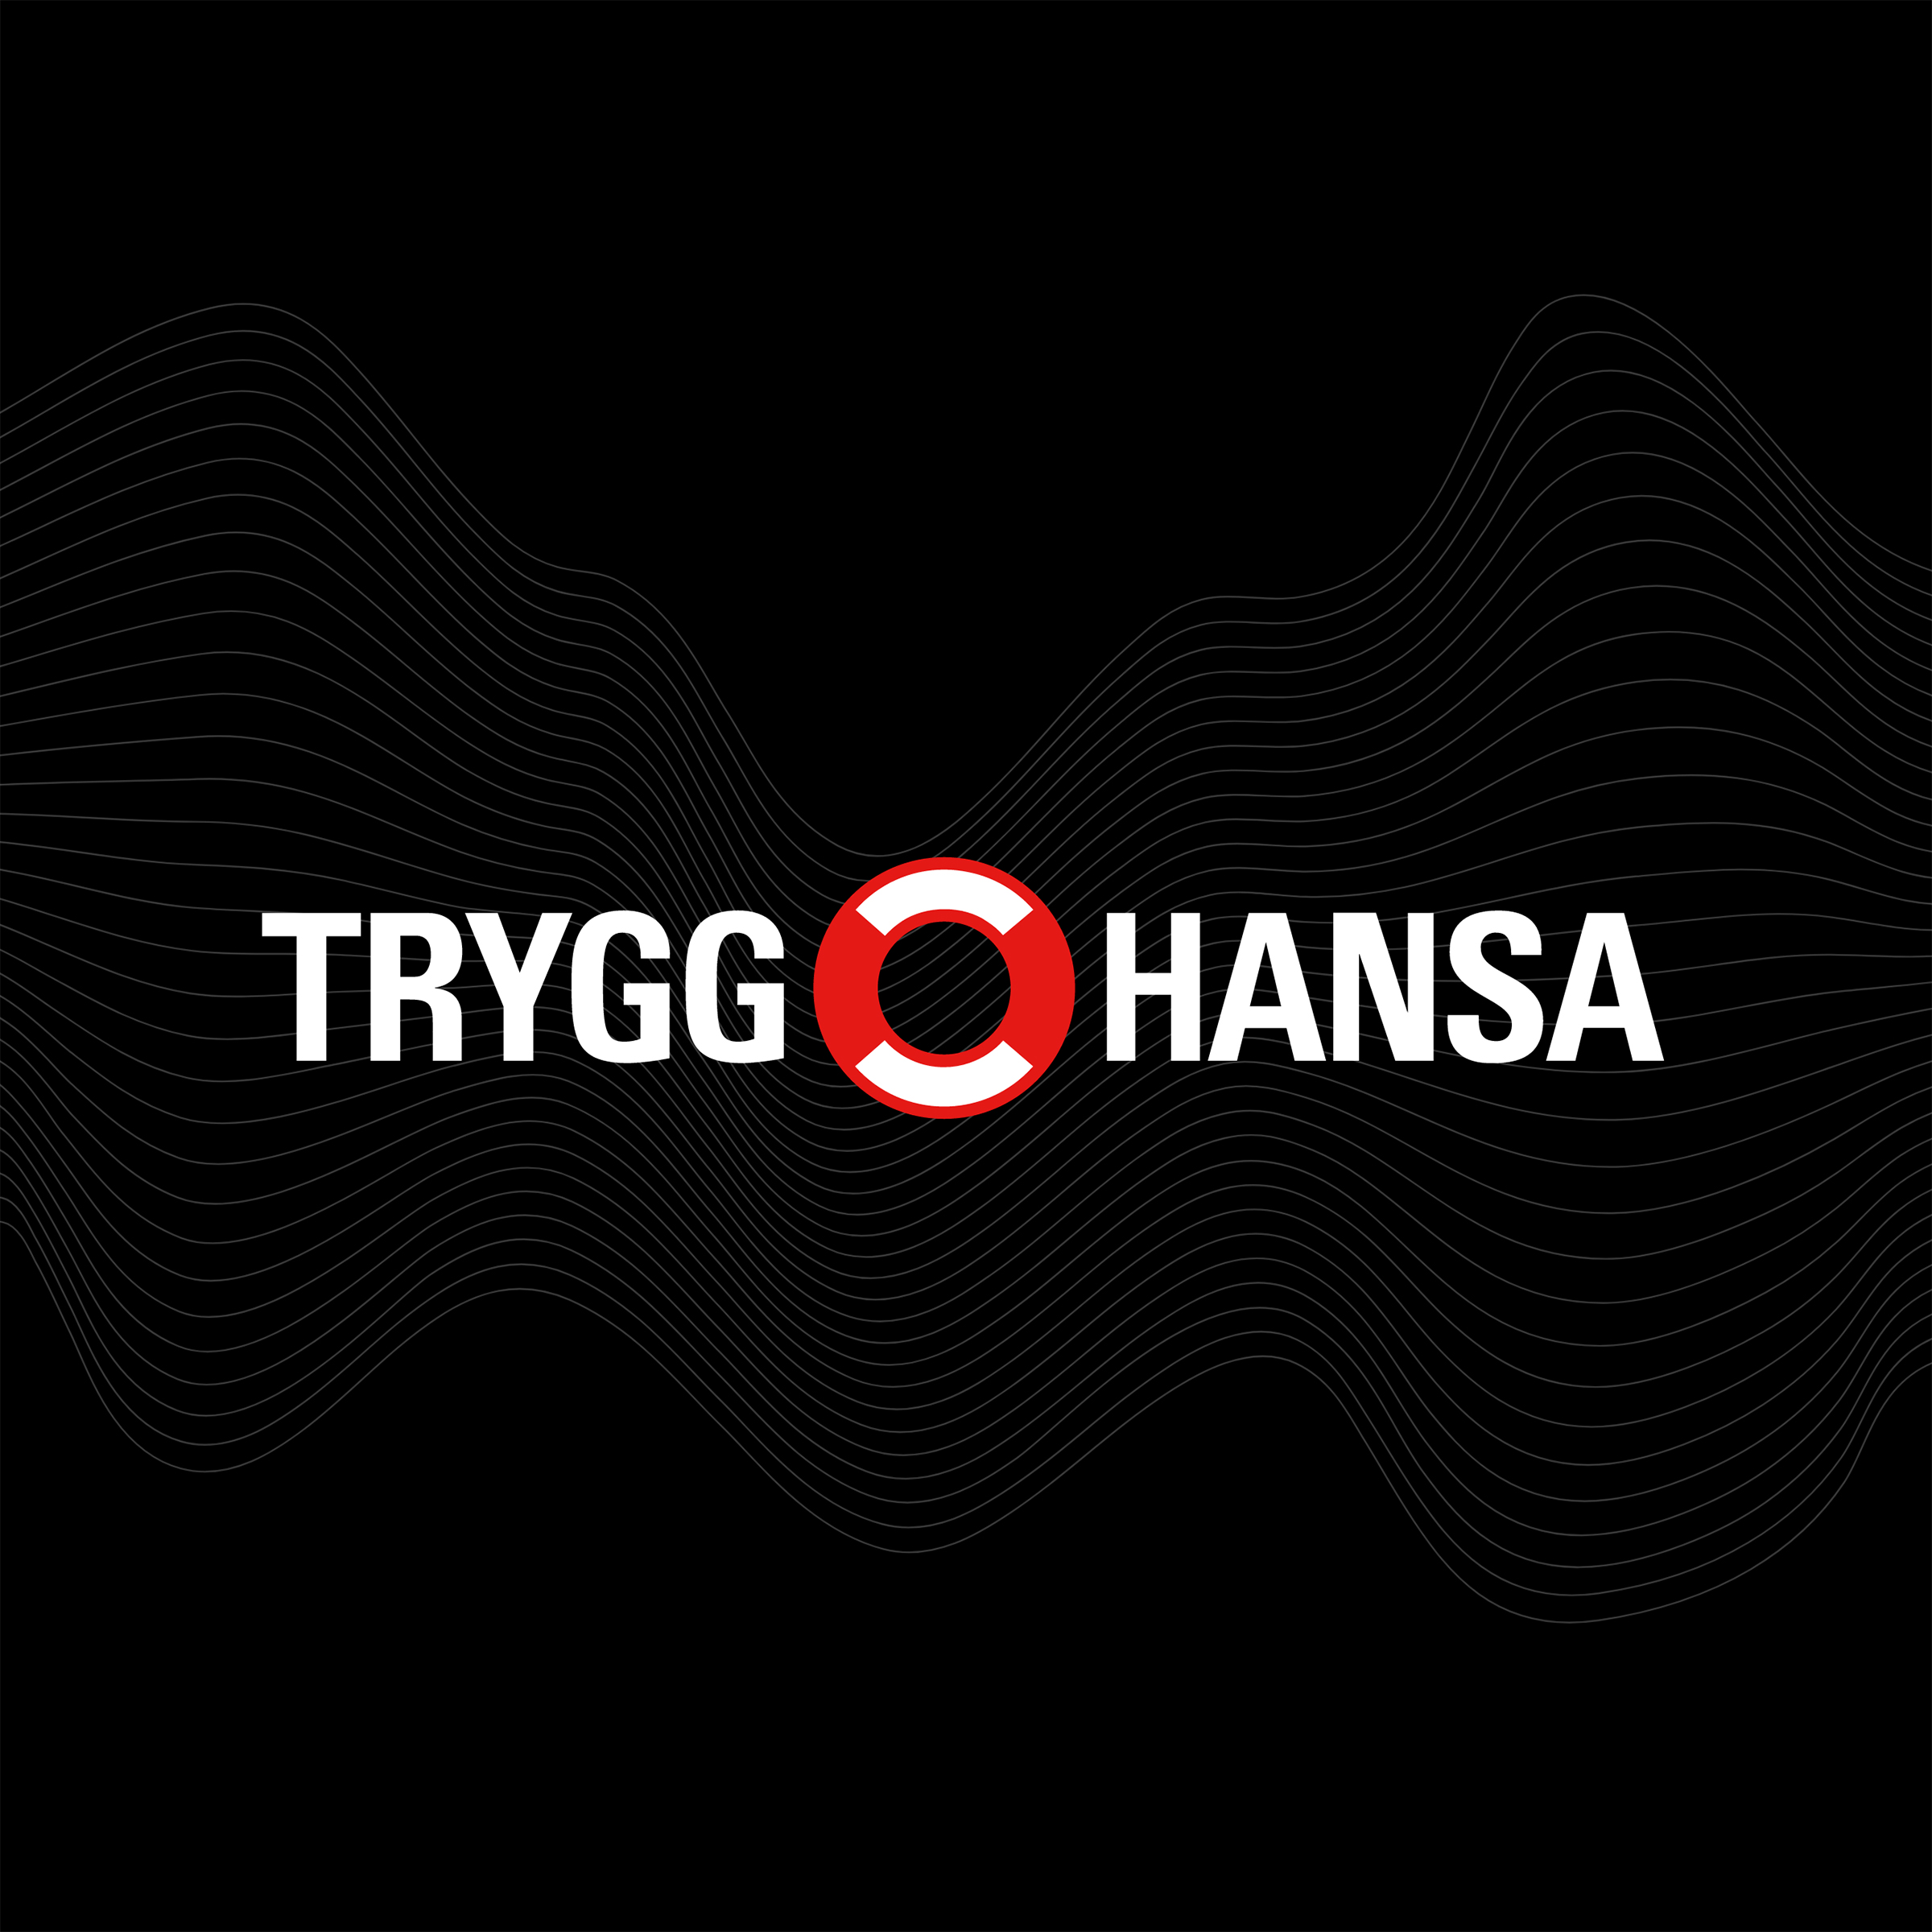 Trygghansa – logo